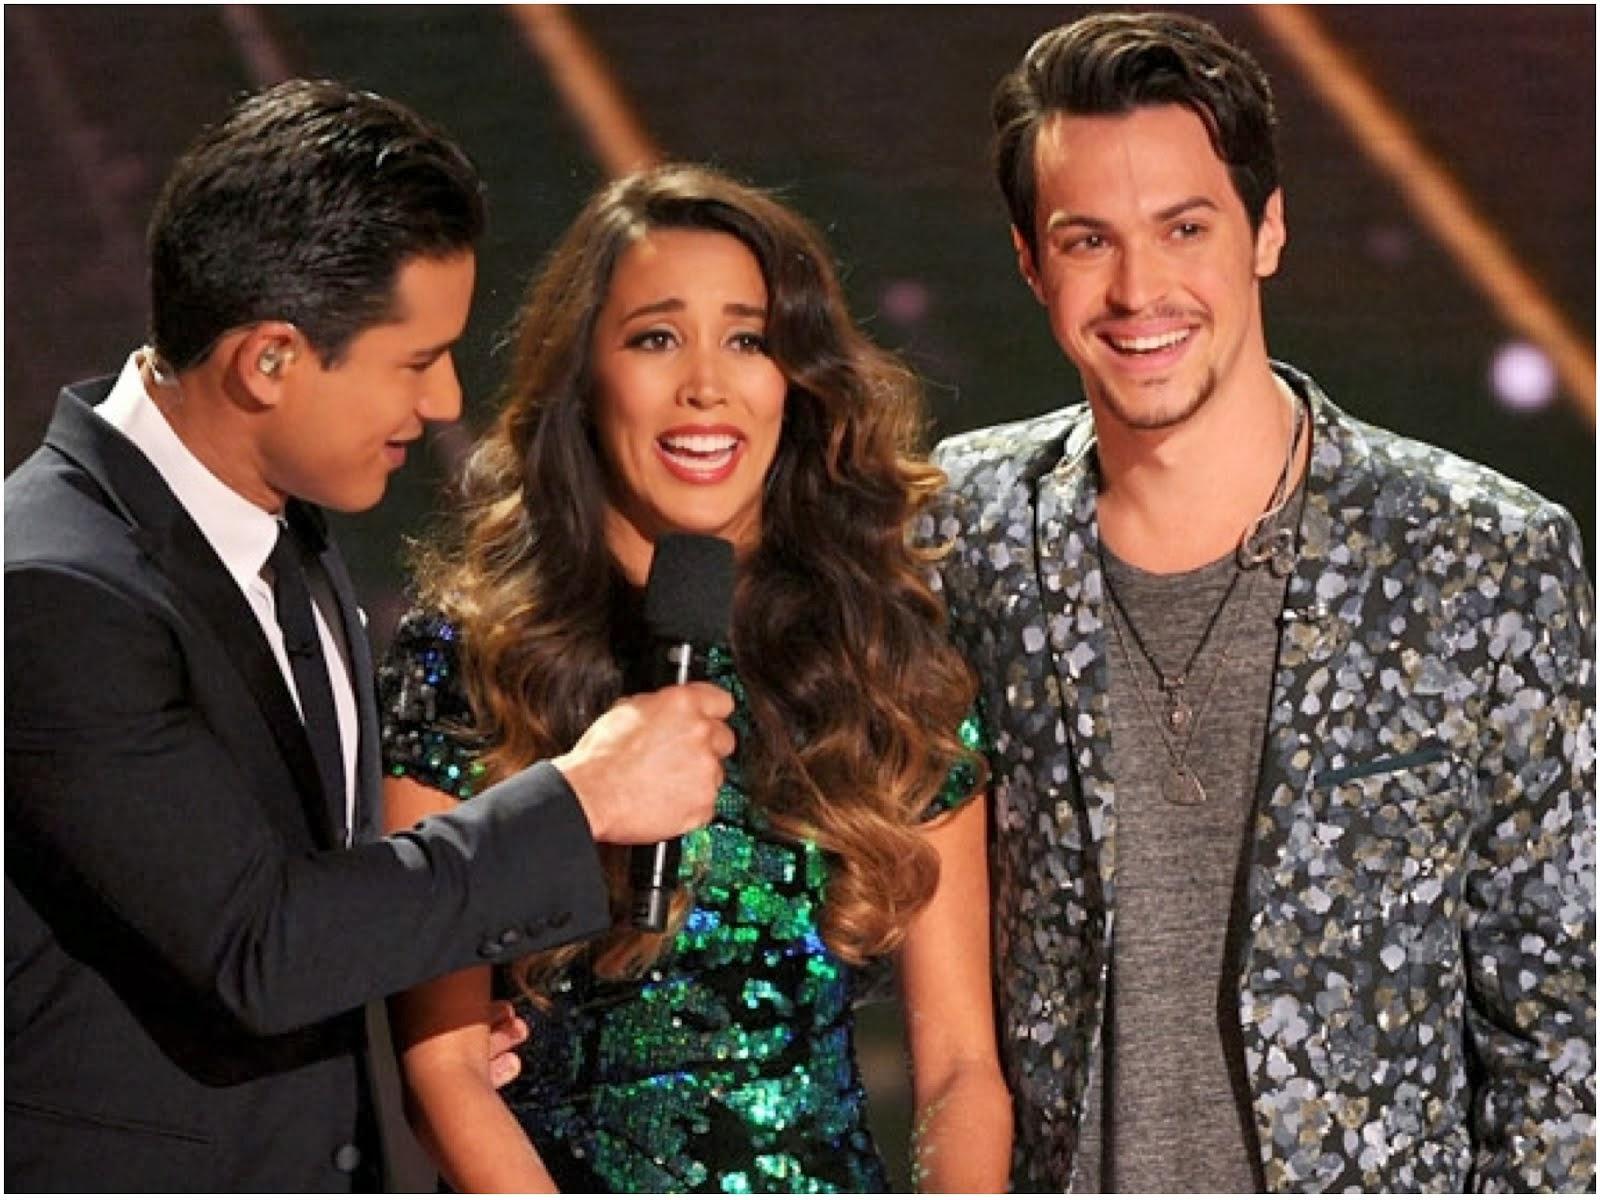 Alex Kinsey of Alex & Sierra in Topman BLACK MONOCHROME FLORAL SKINNY BLAZER - X Factor USA Finals